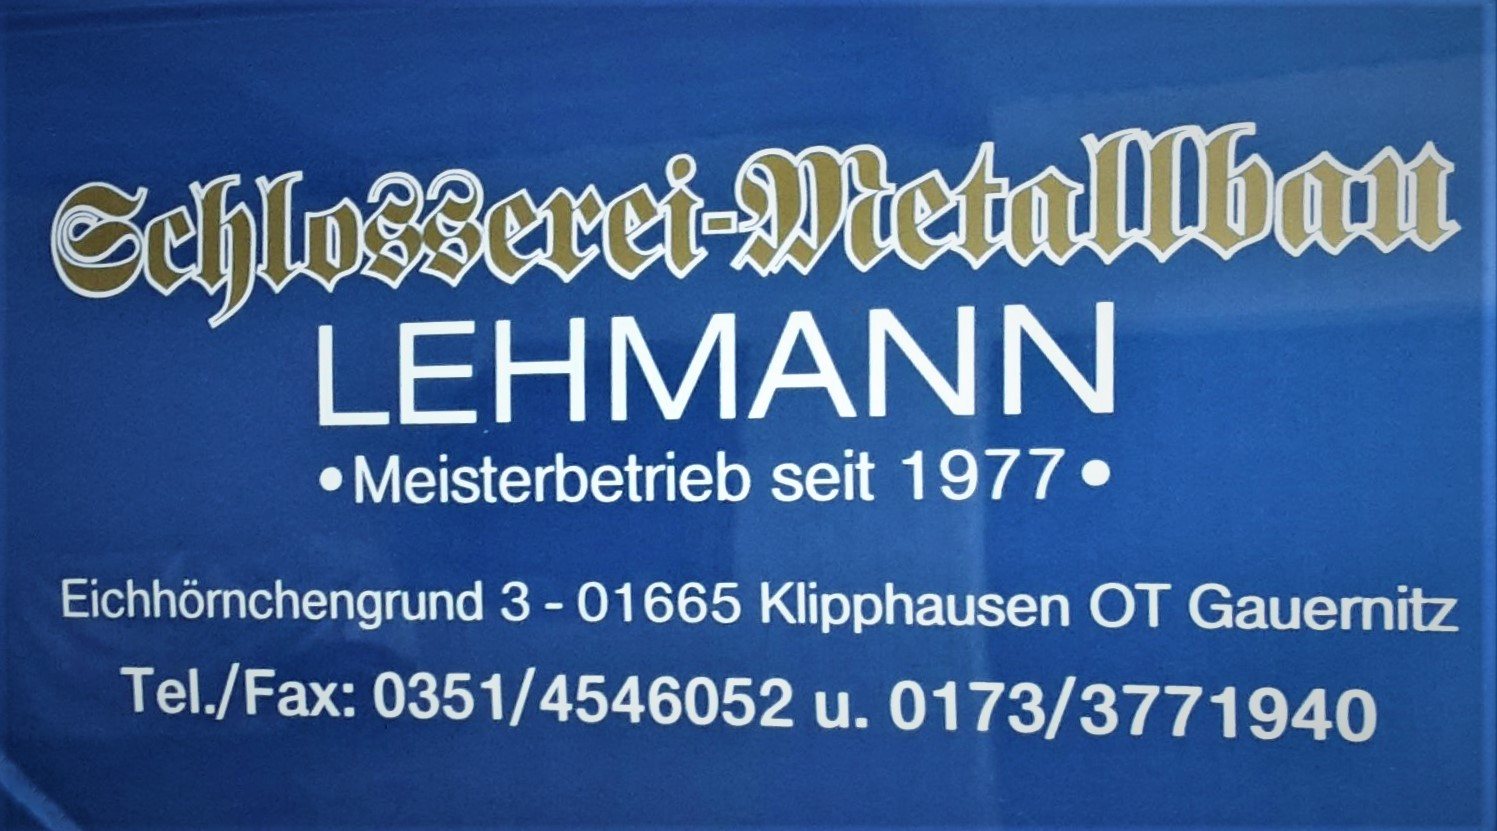 Metallschlosserei Lehmann